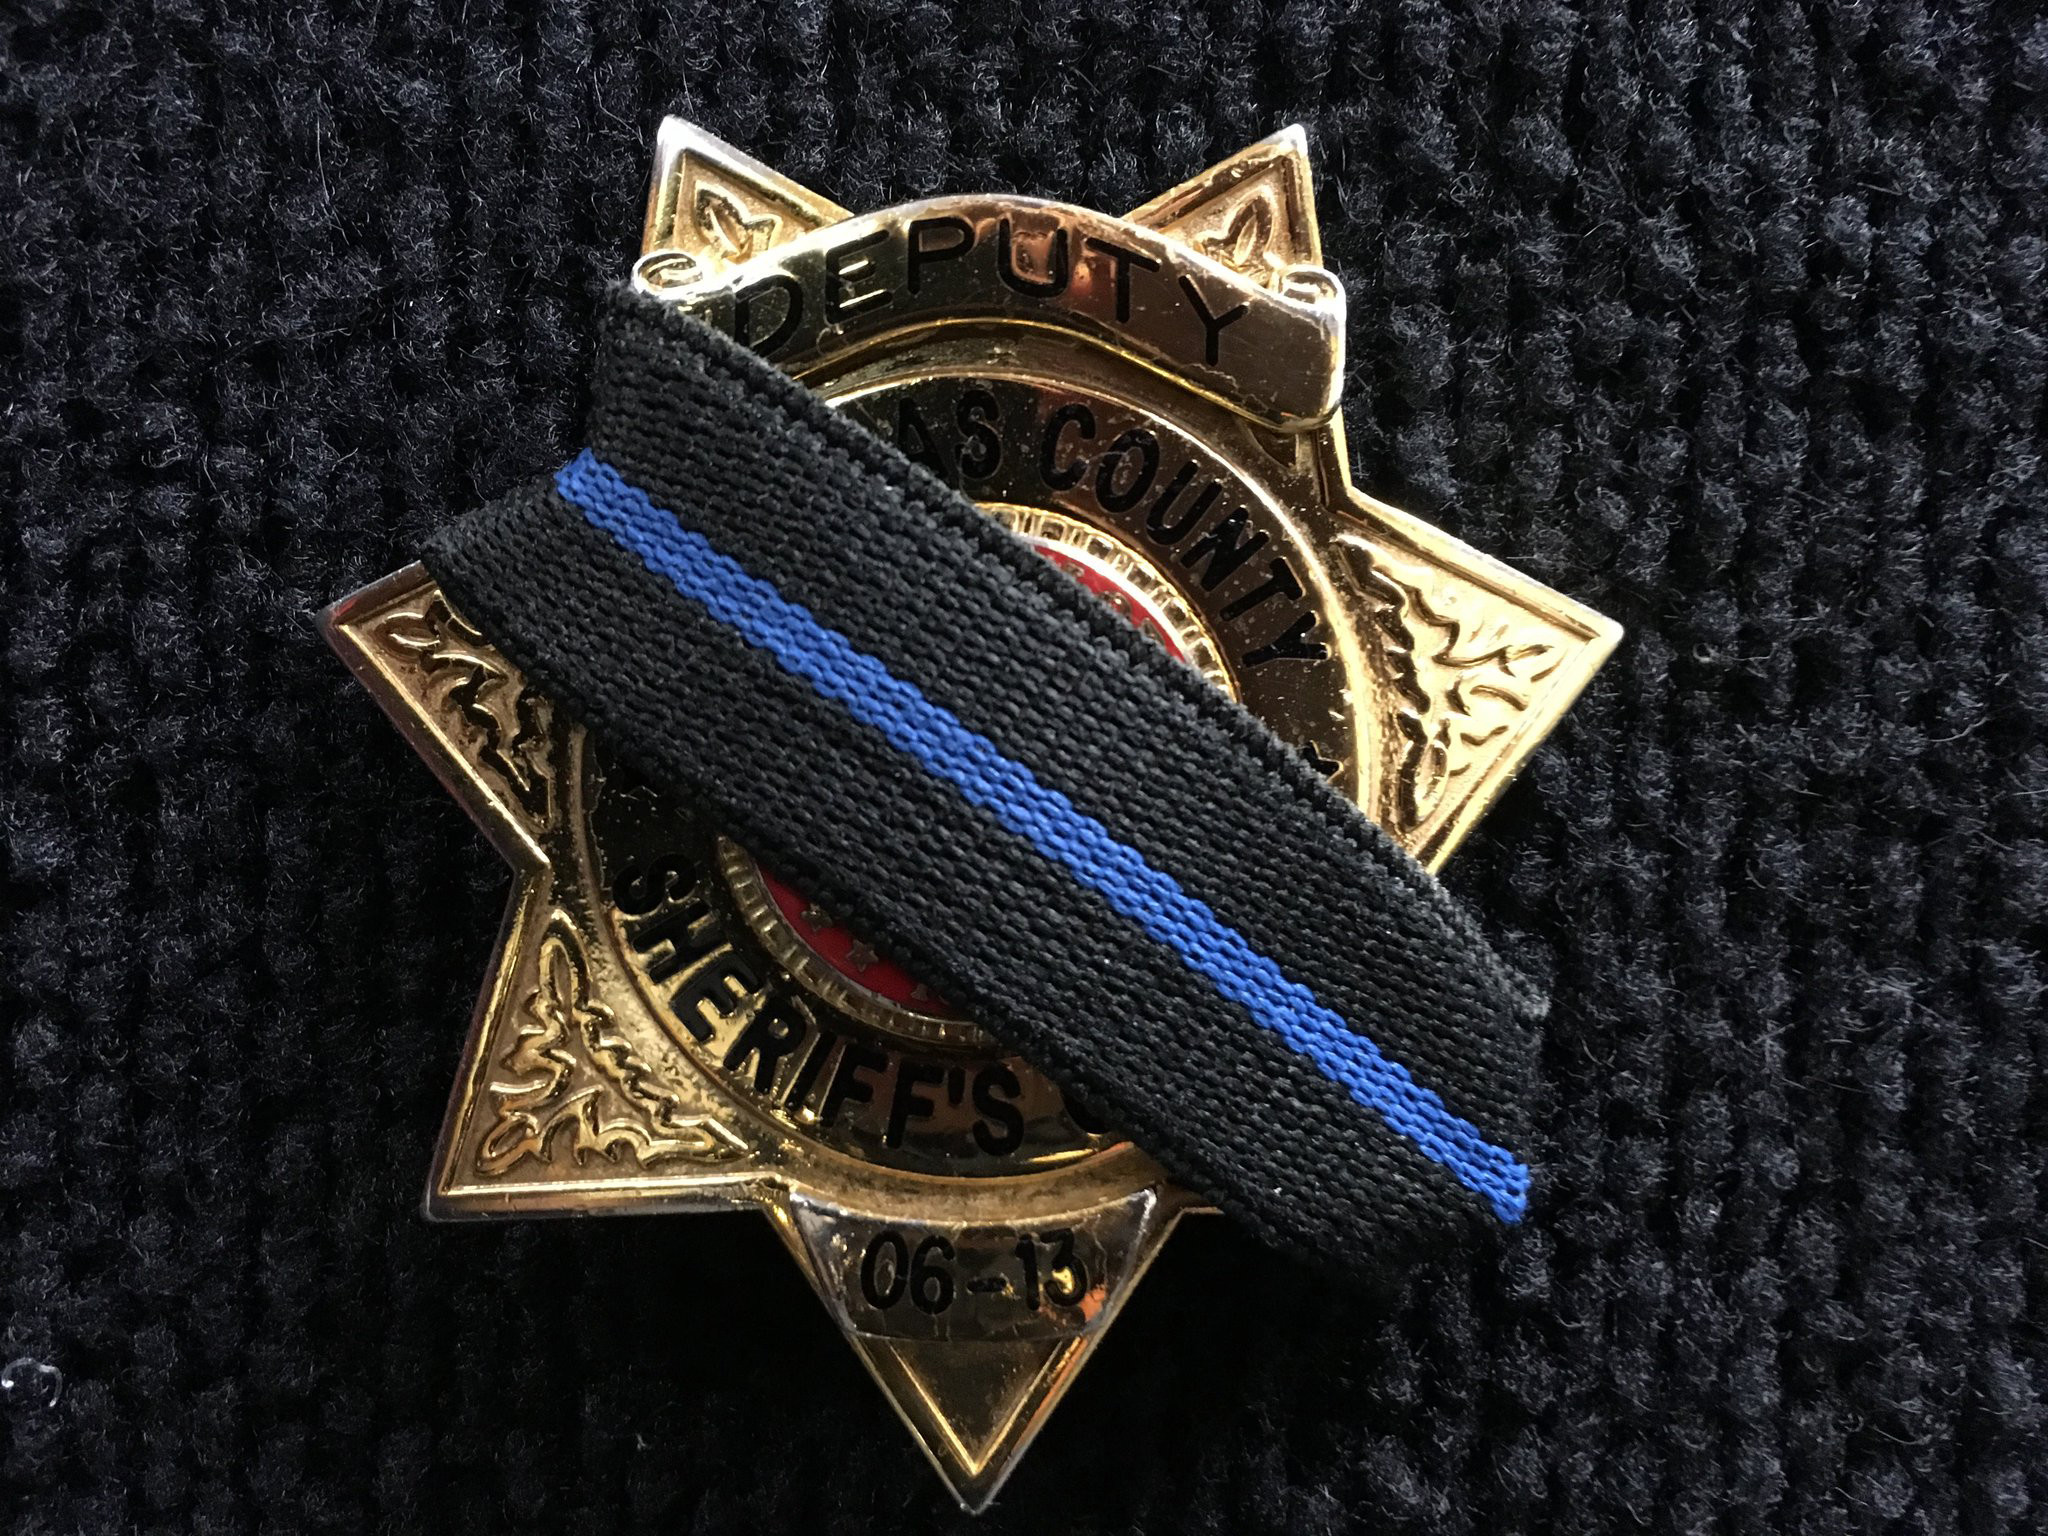 Rep. Ben Ray Luján Statement On Recent Shootings